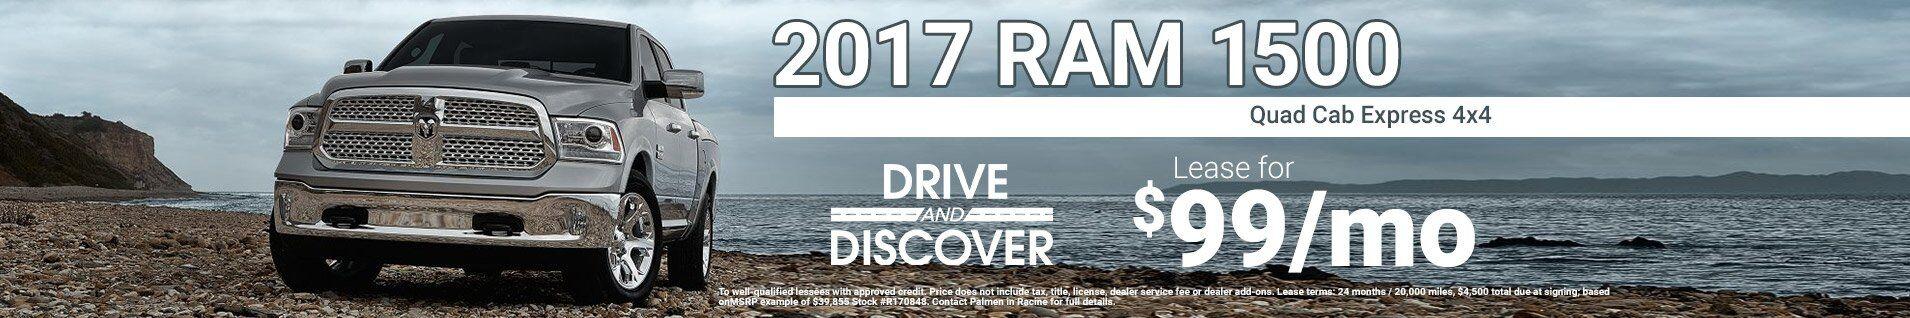 2017 RAM 1500 Express